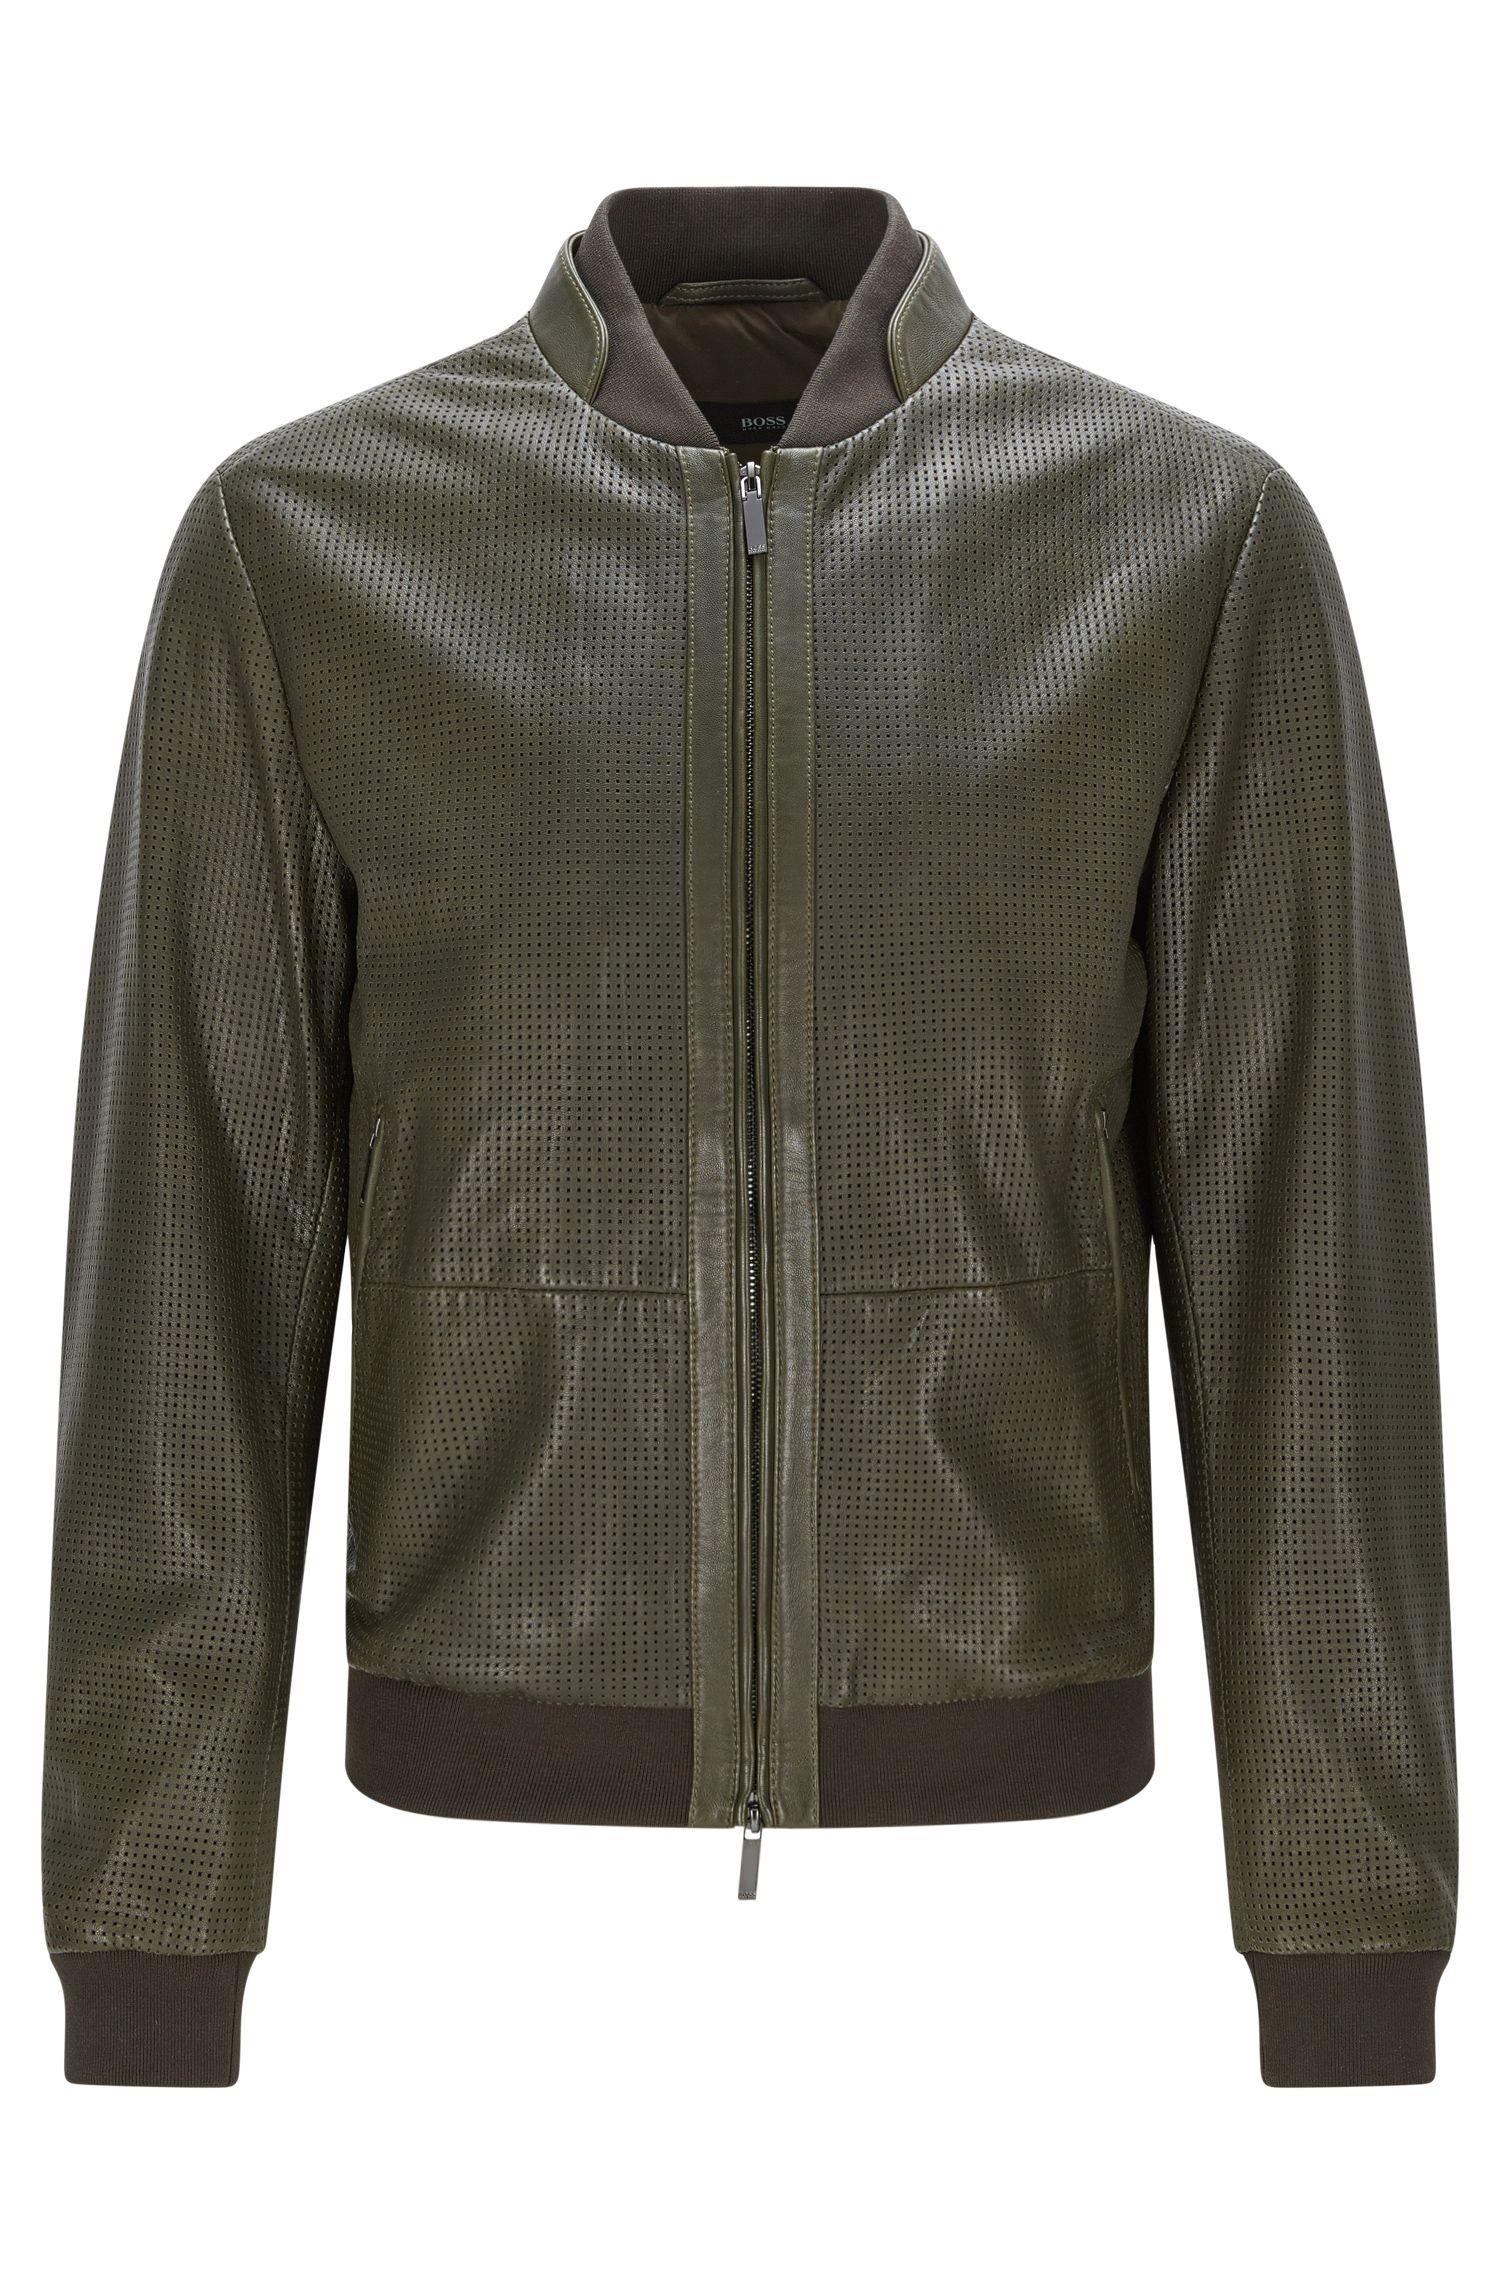 'Meritz' | Regular Fit, Perforated Nappa Leather Jacket